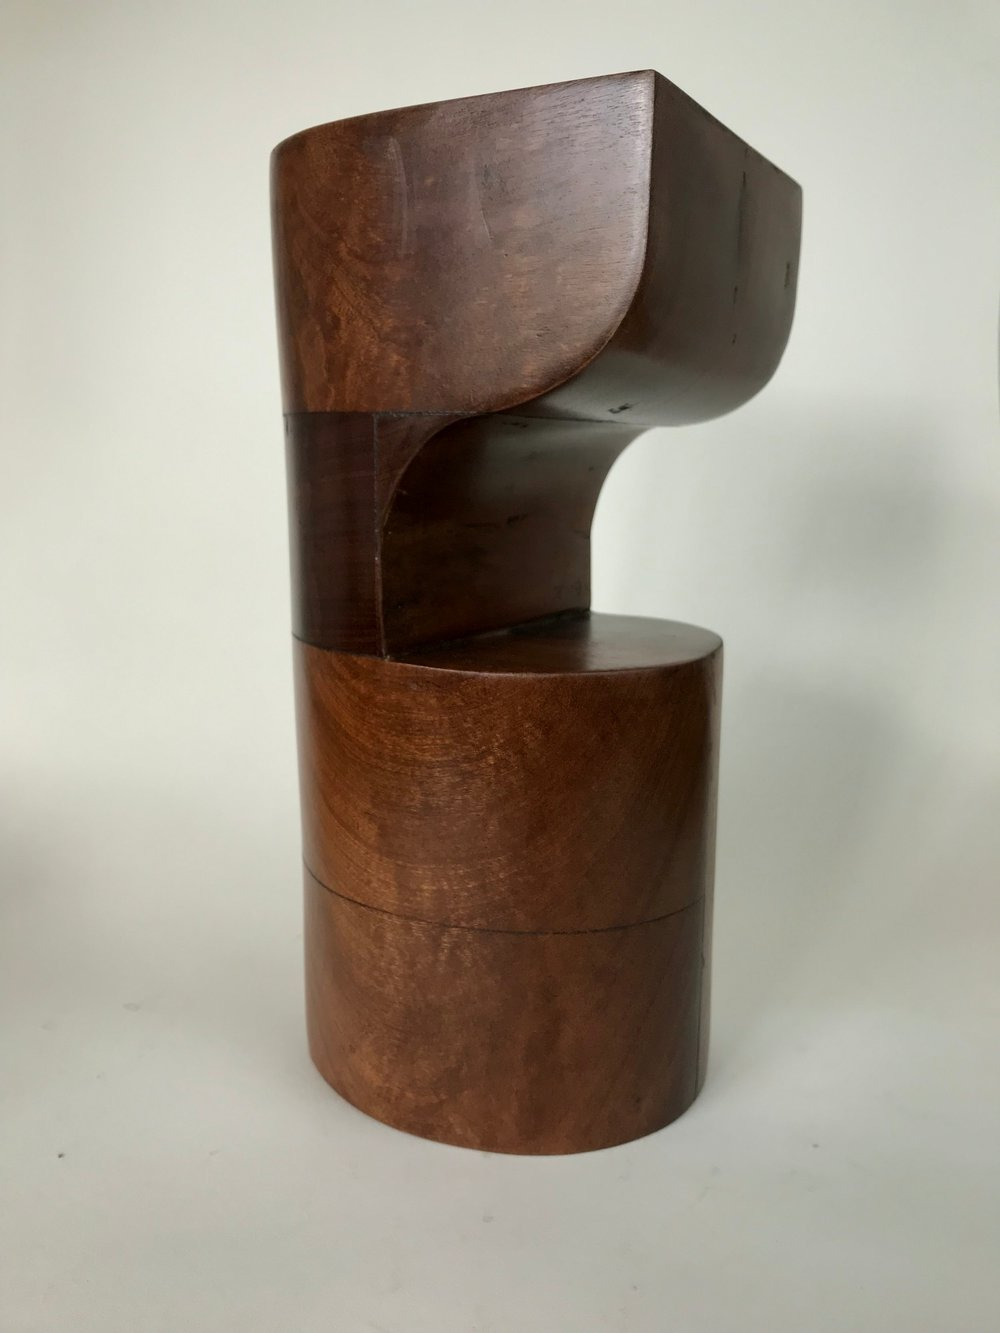 'Liner', Sapele wood, 13x14x29cm